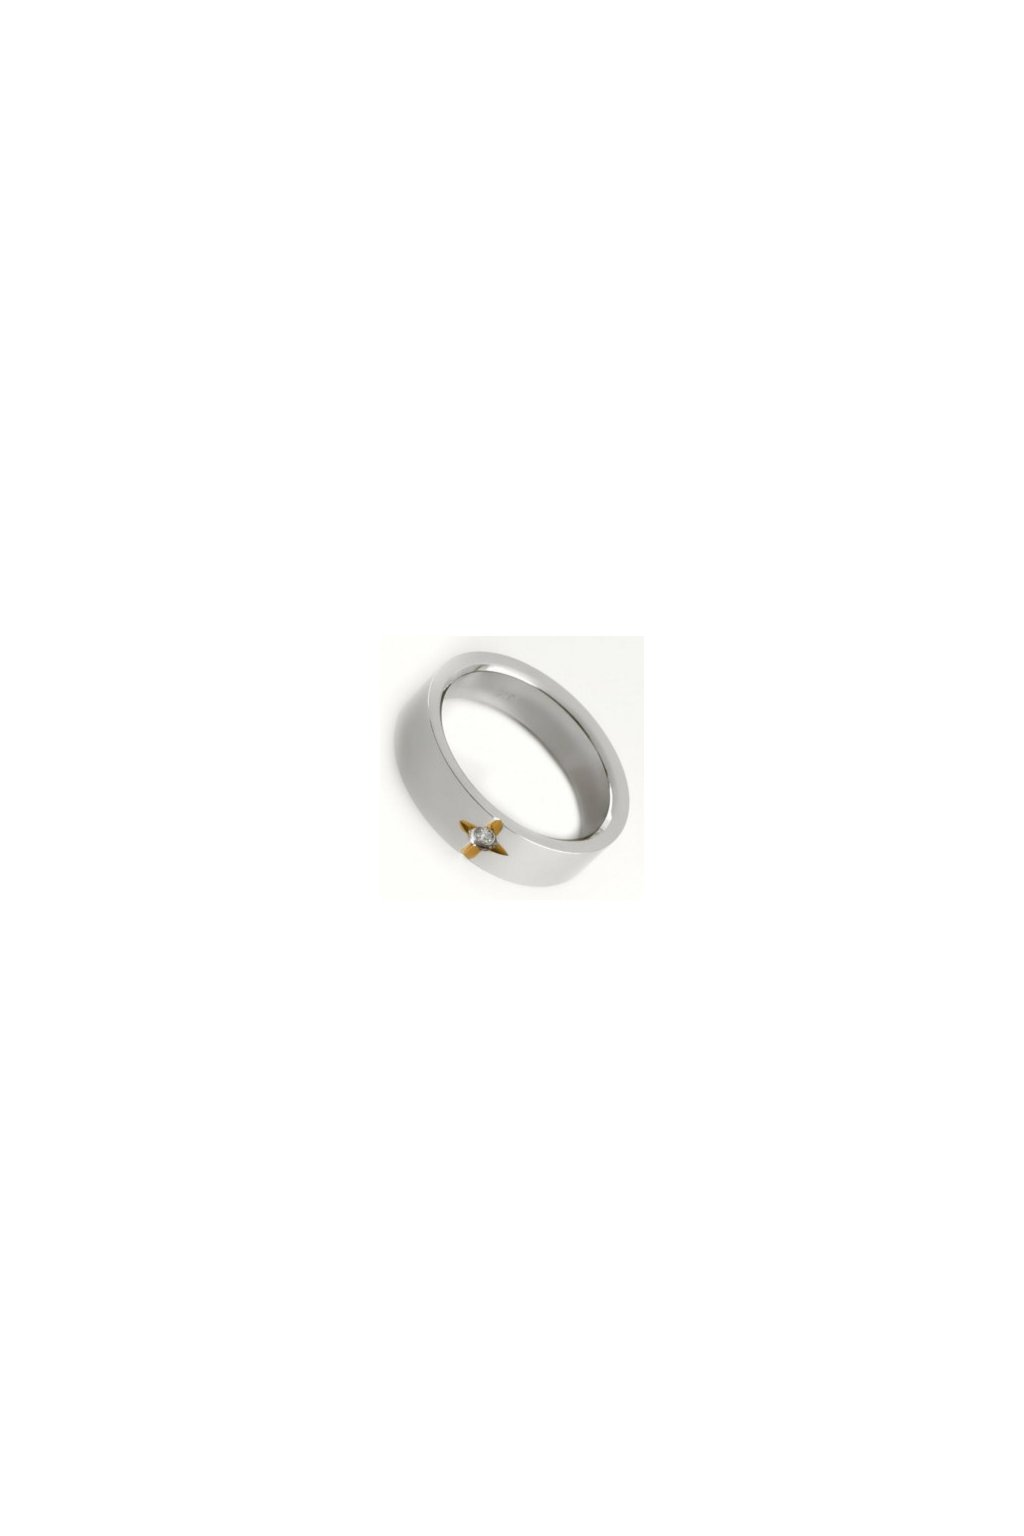 Skalimar Prsten z chirurgické oceli S HVĚZDOU A ZIRKONEM 212015